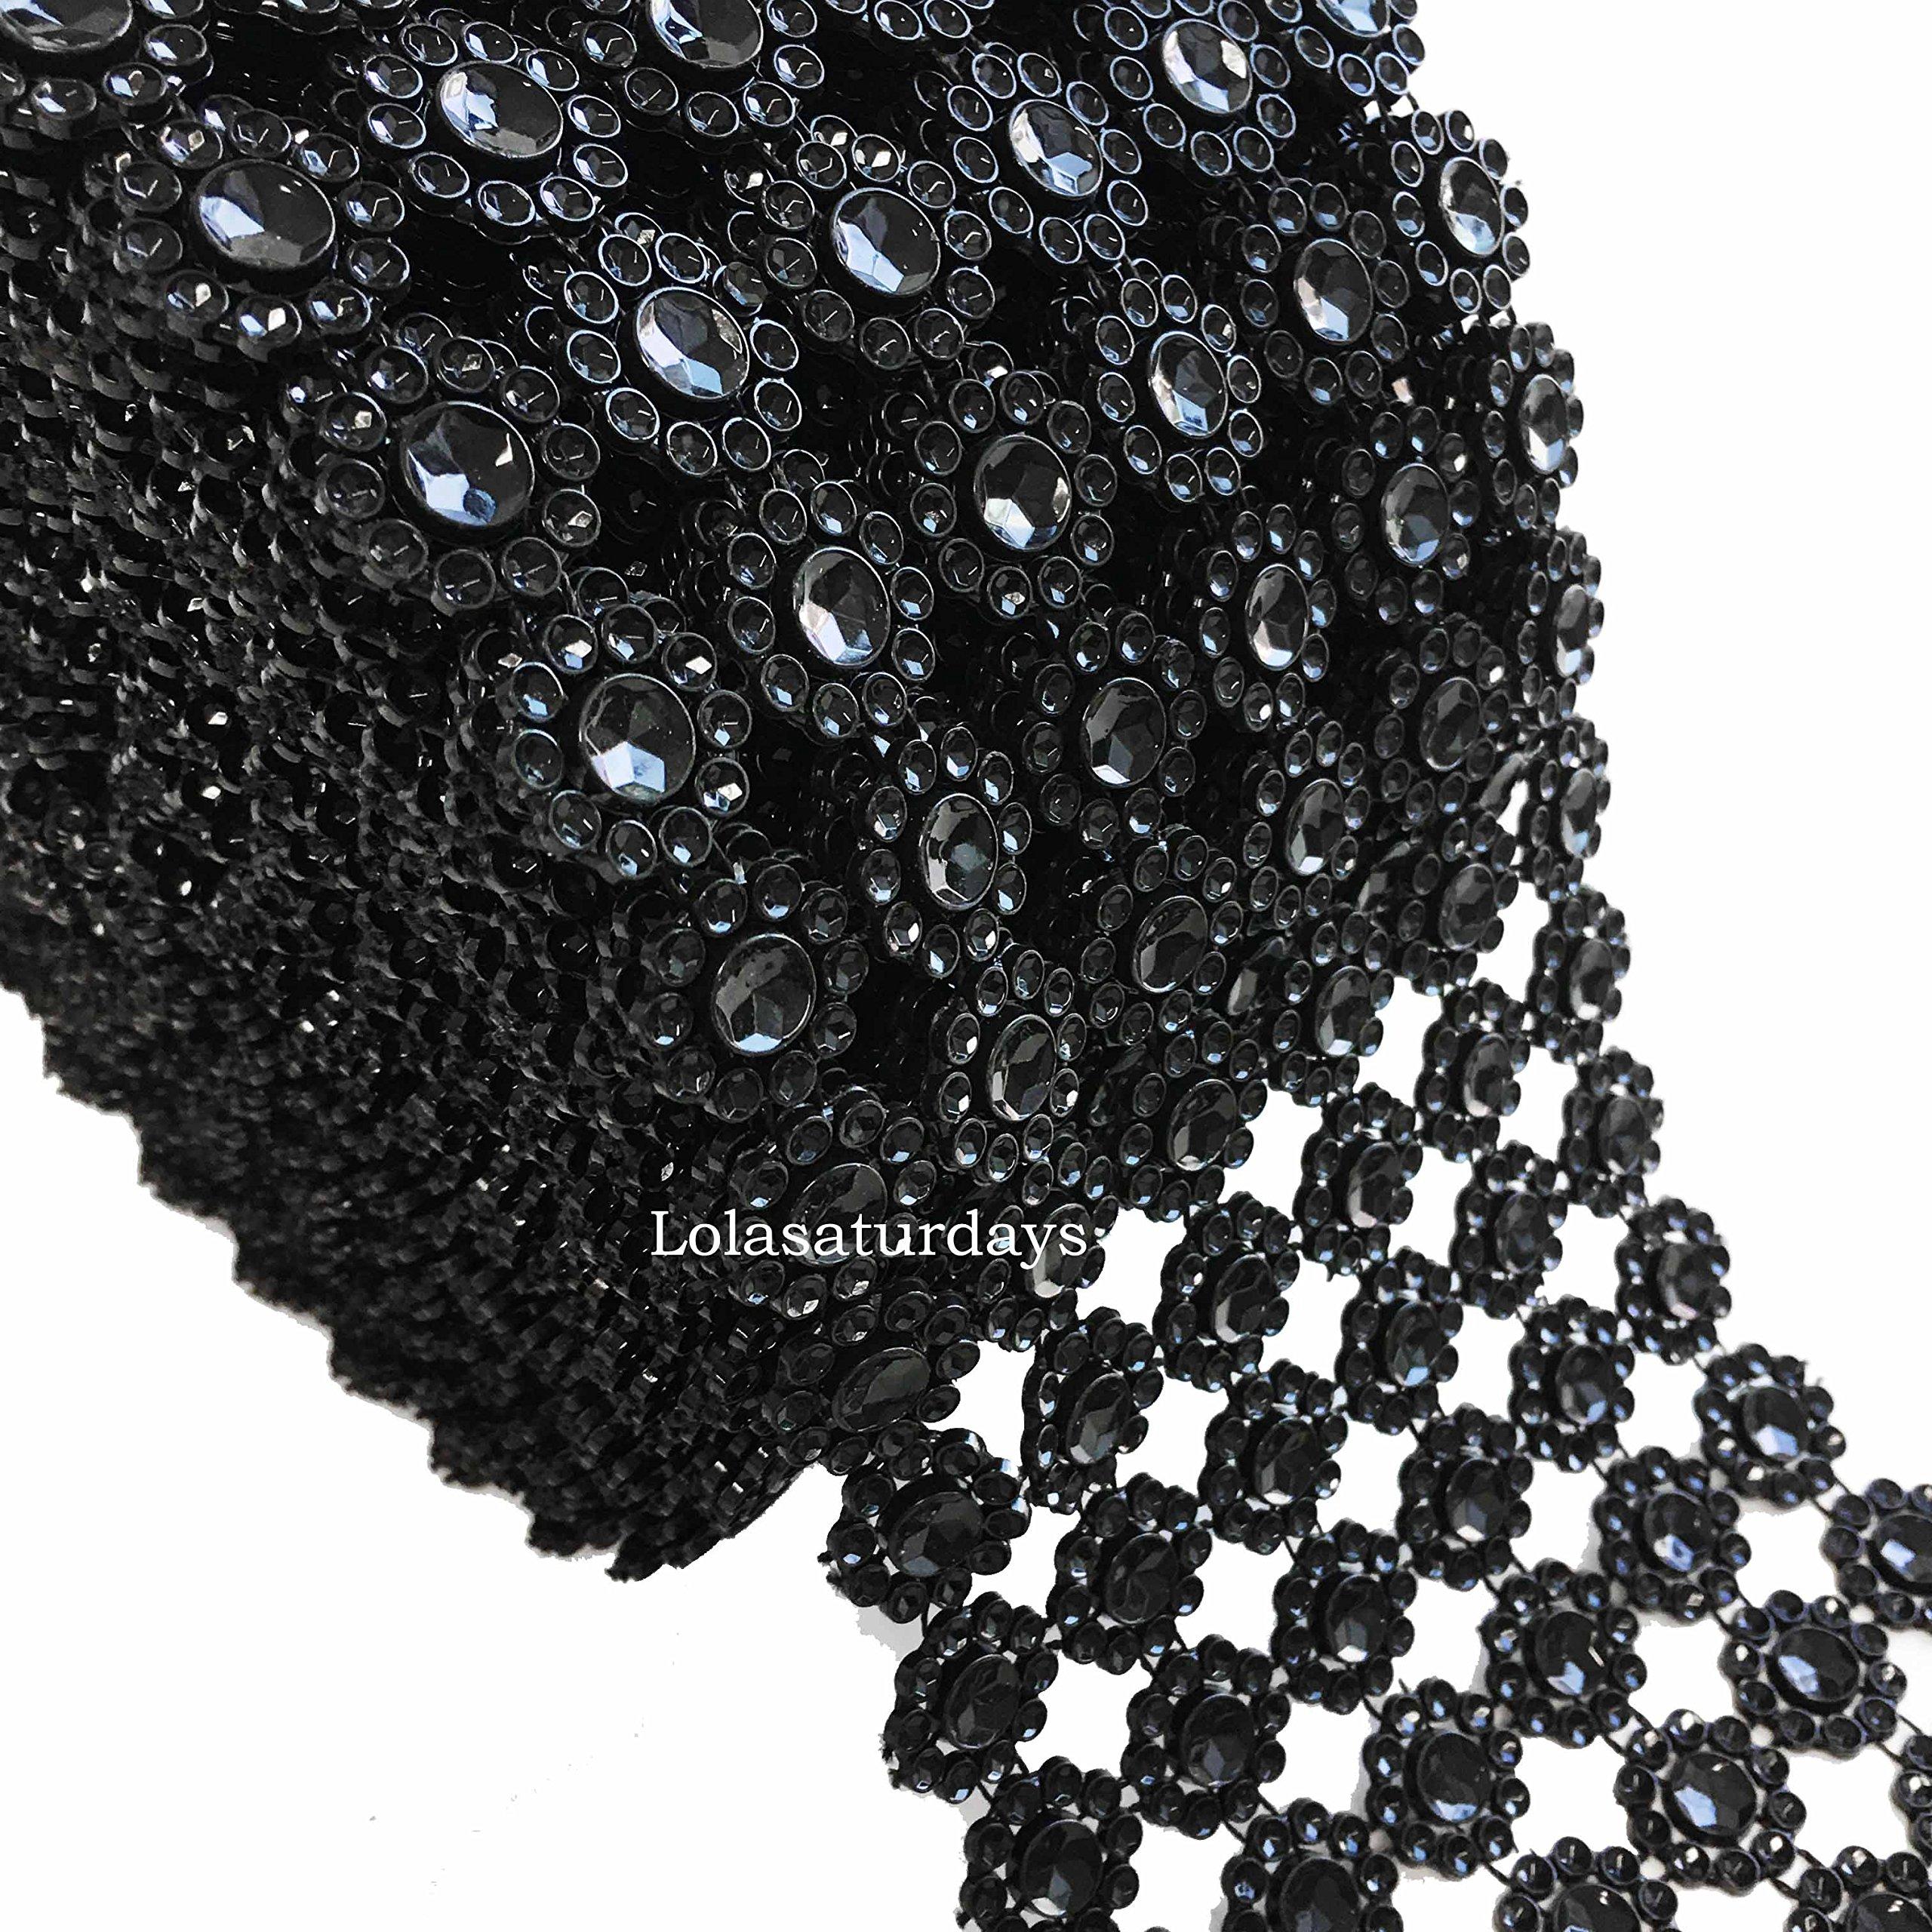 LolaSaturdays 4.5x 30FT Diamond Rhinestone Ribbon Wrap Roll Cake and Party Decoration Diamond, Black